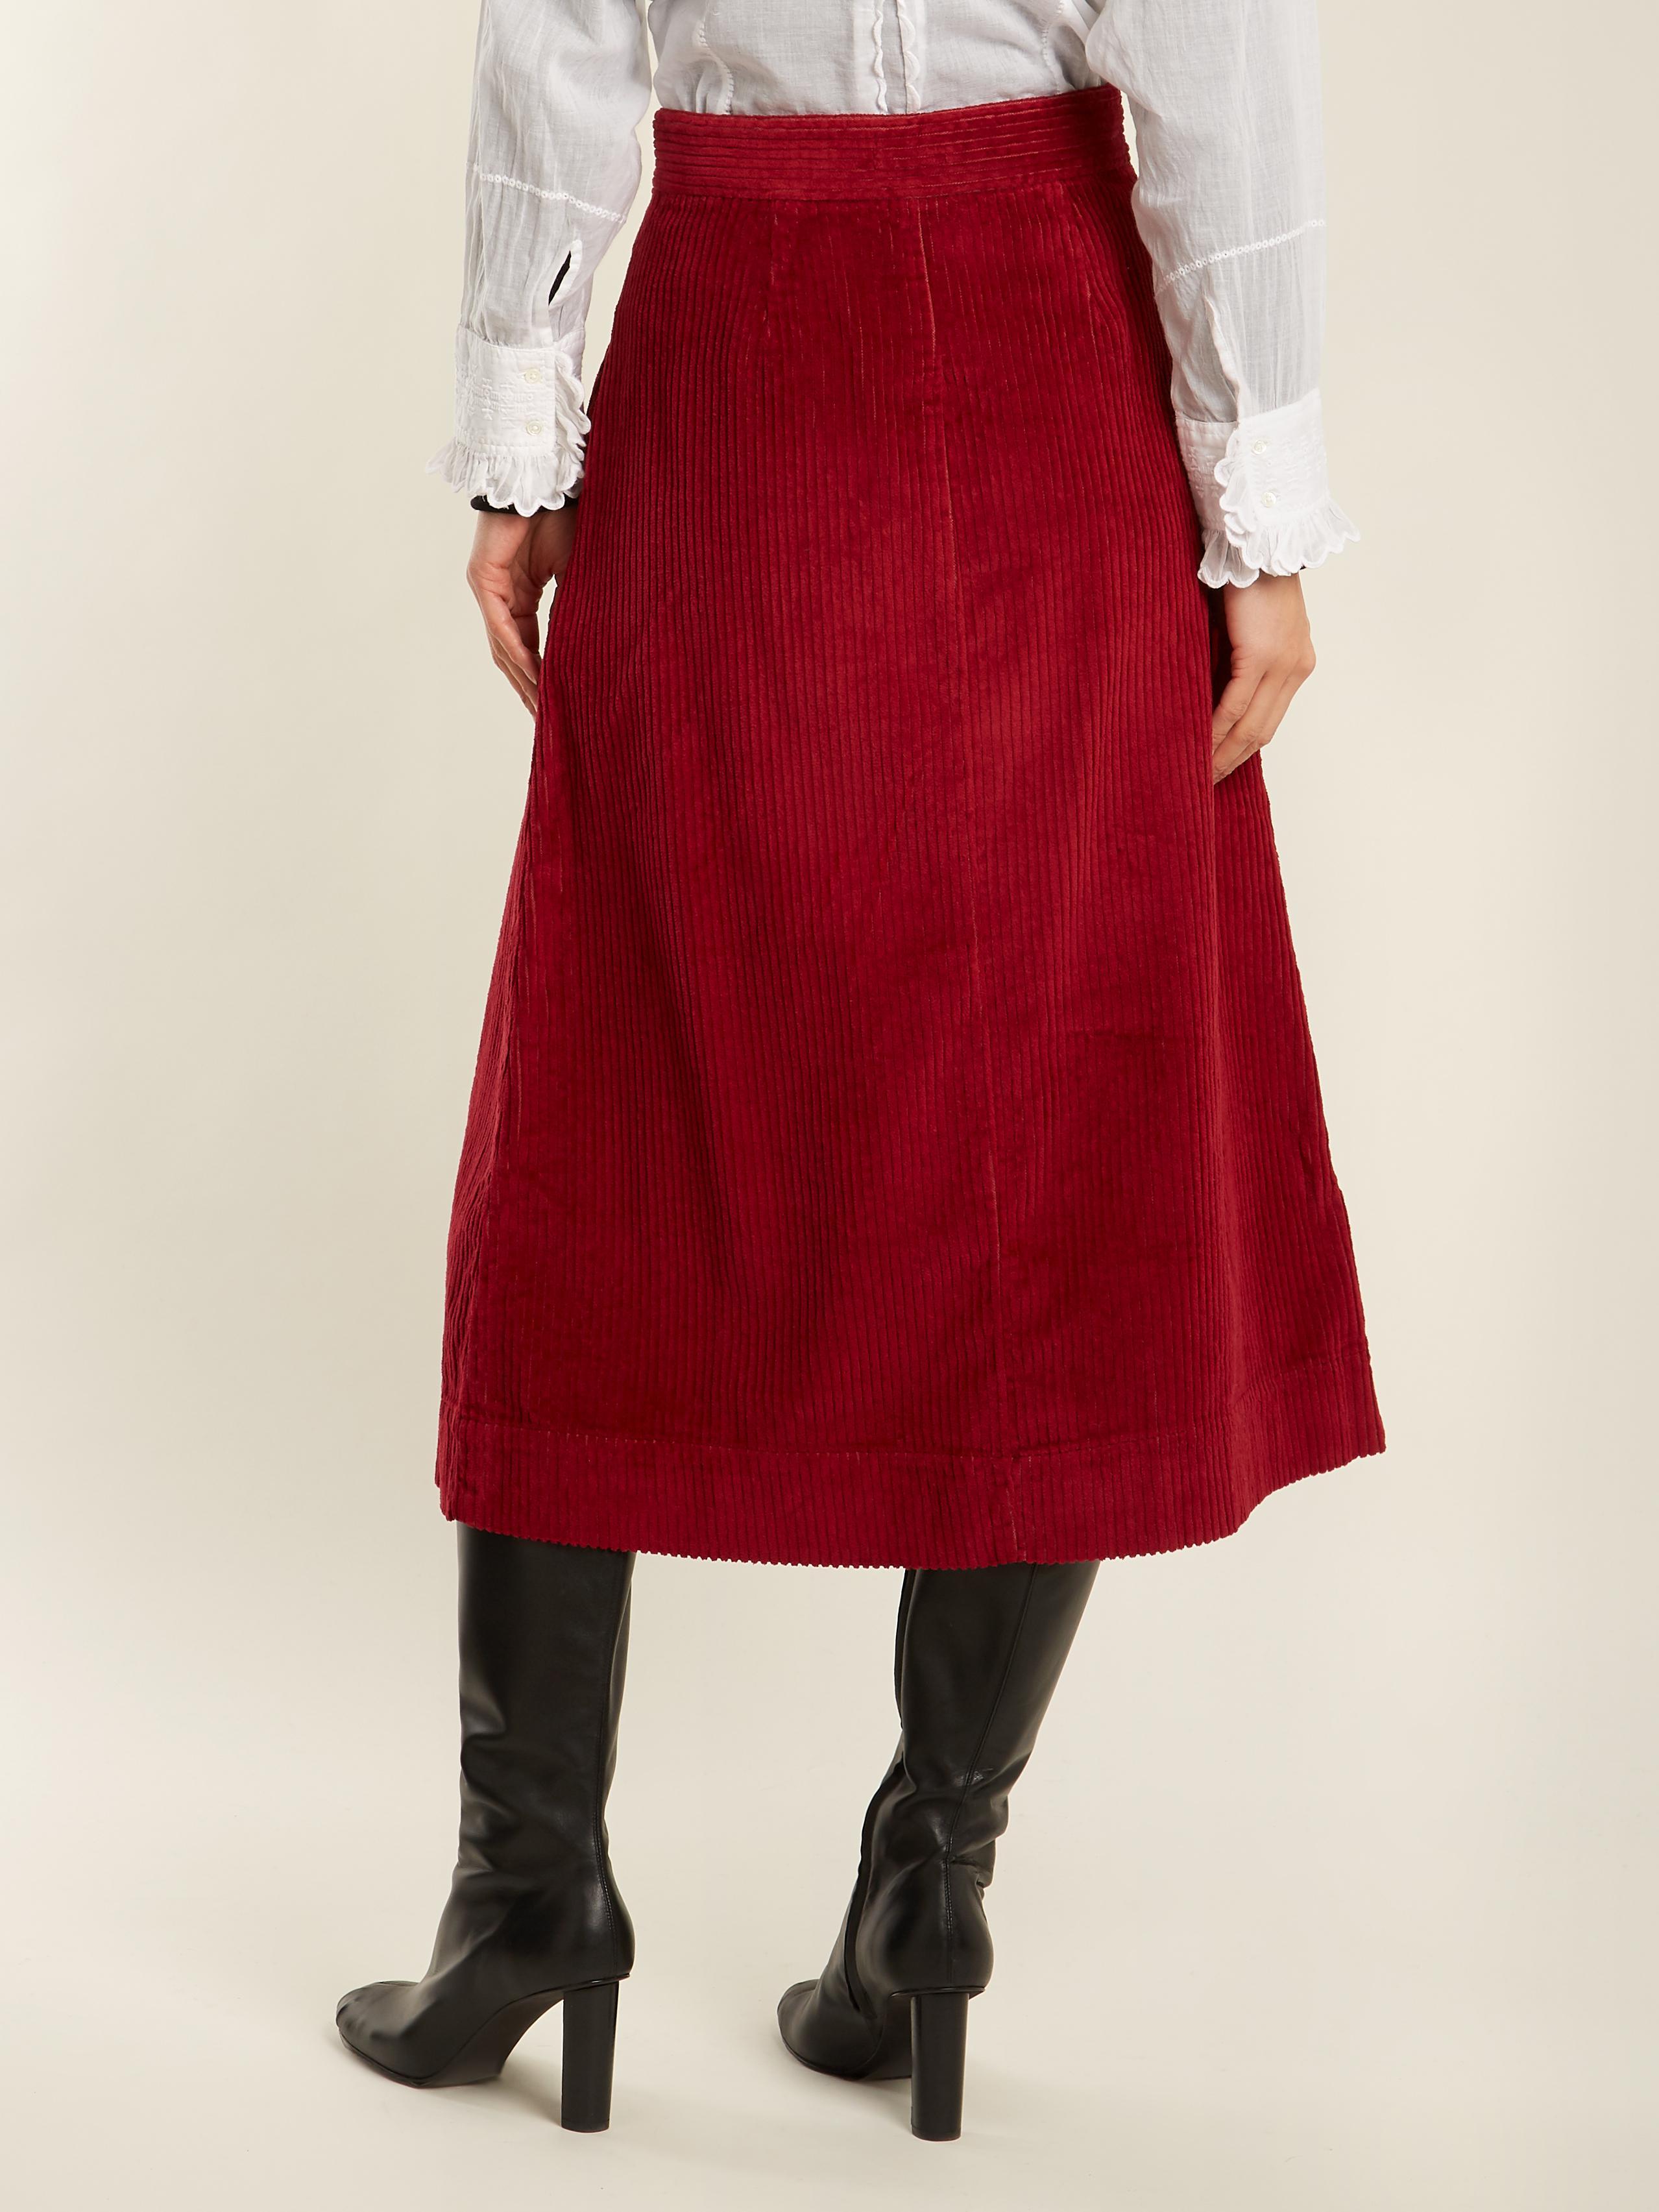 c9a8f2f8b MASSCOB A-line Cotton-blend Corduroy Midi Skirt in Red - Lyst